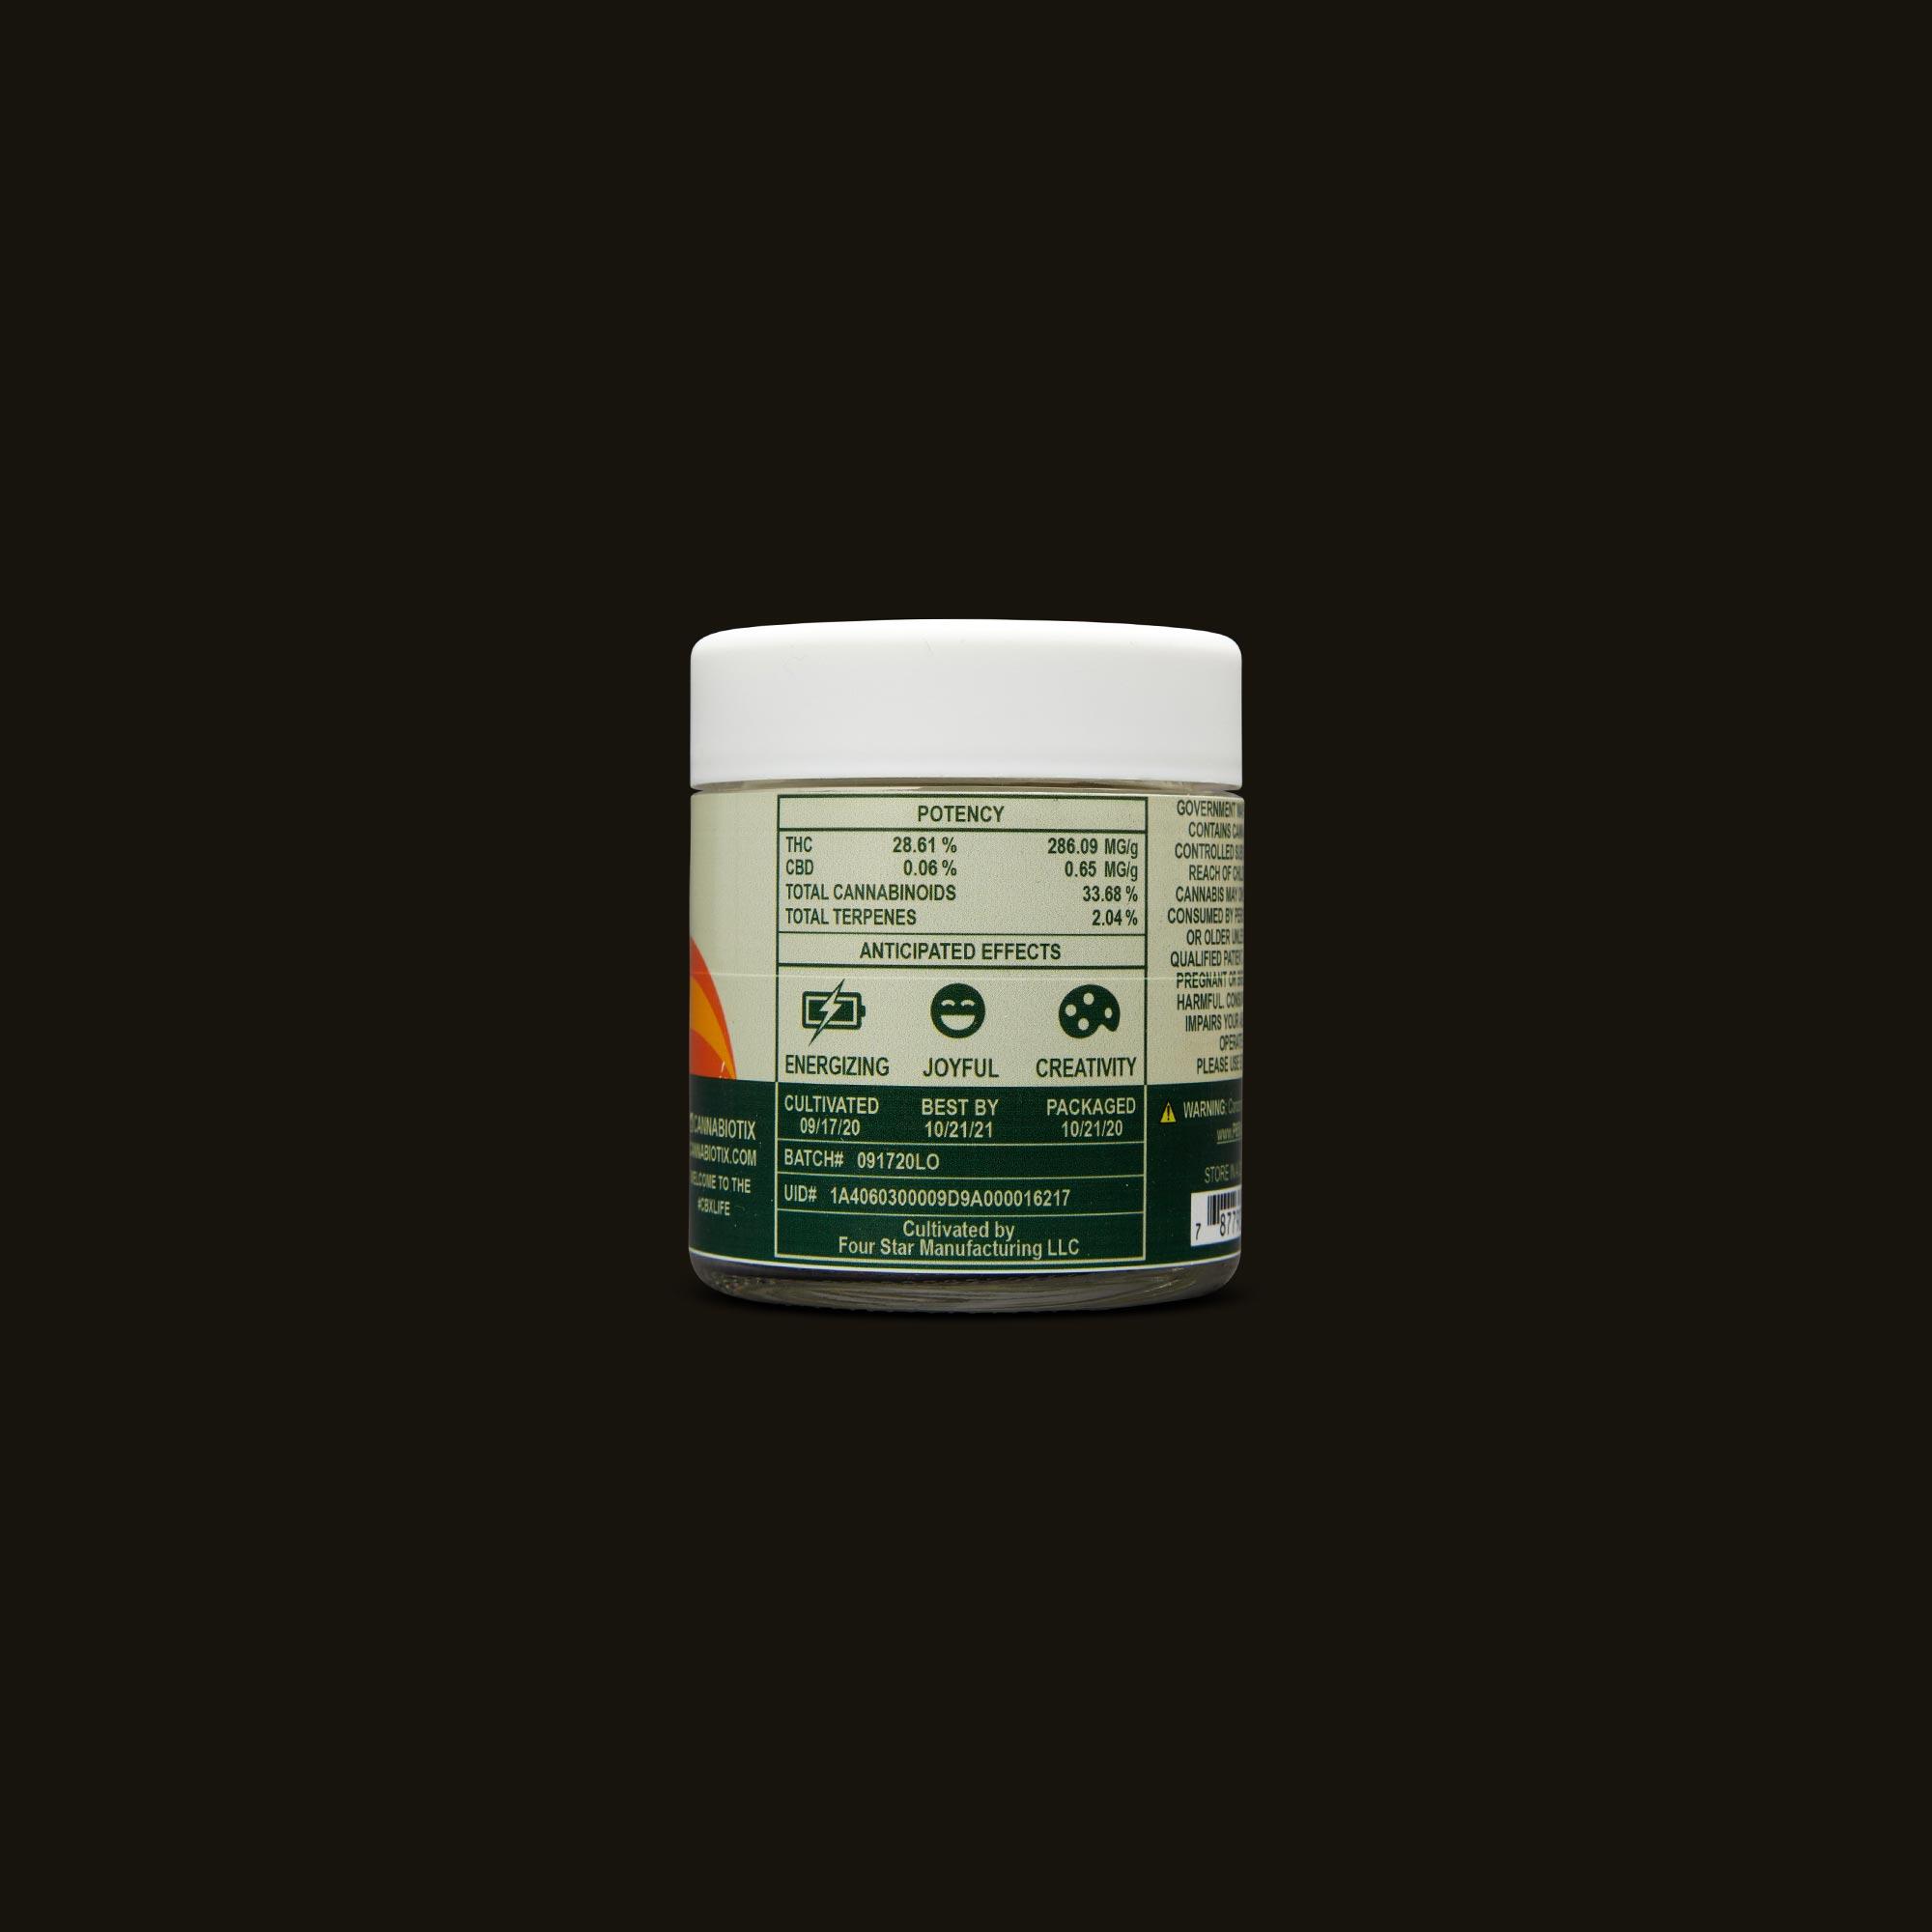 Cannabiotix (CBX) L'Orange Ingredients